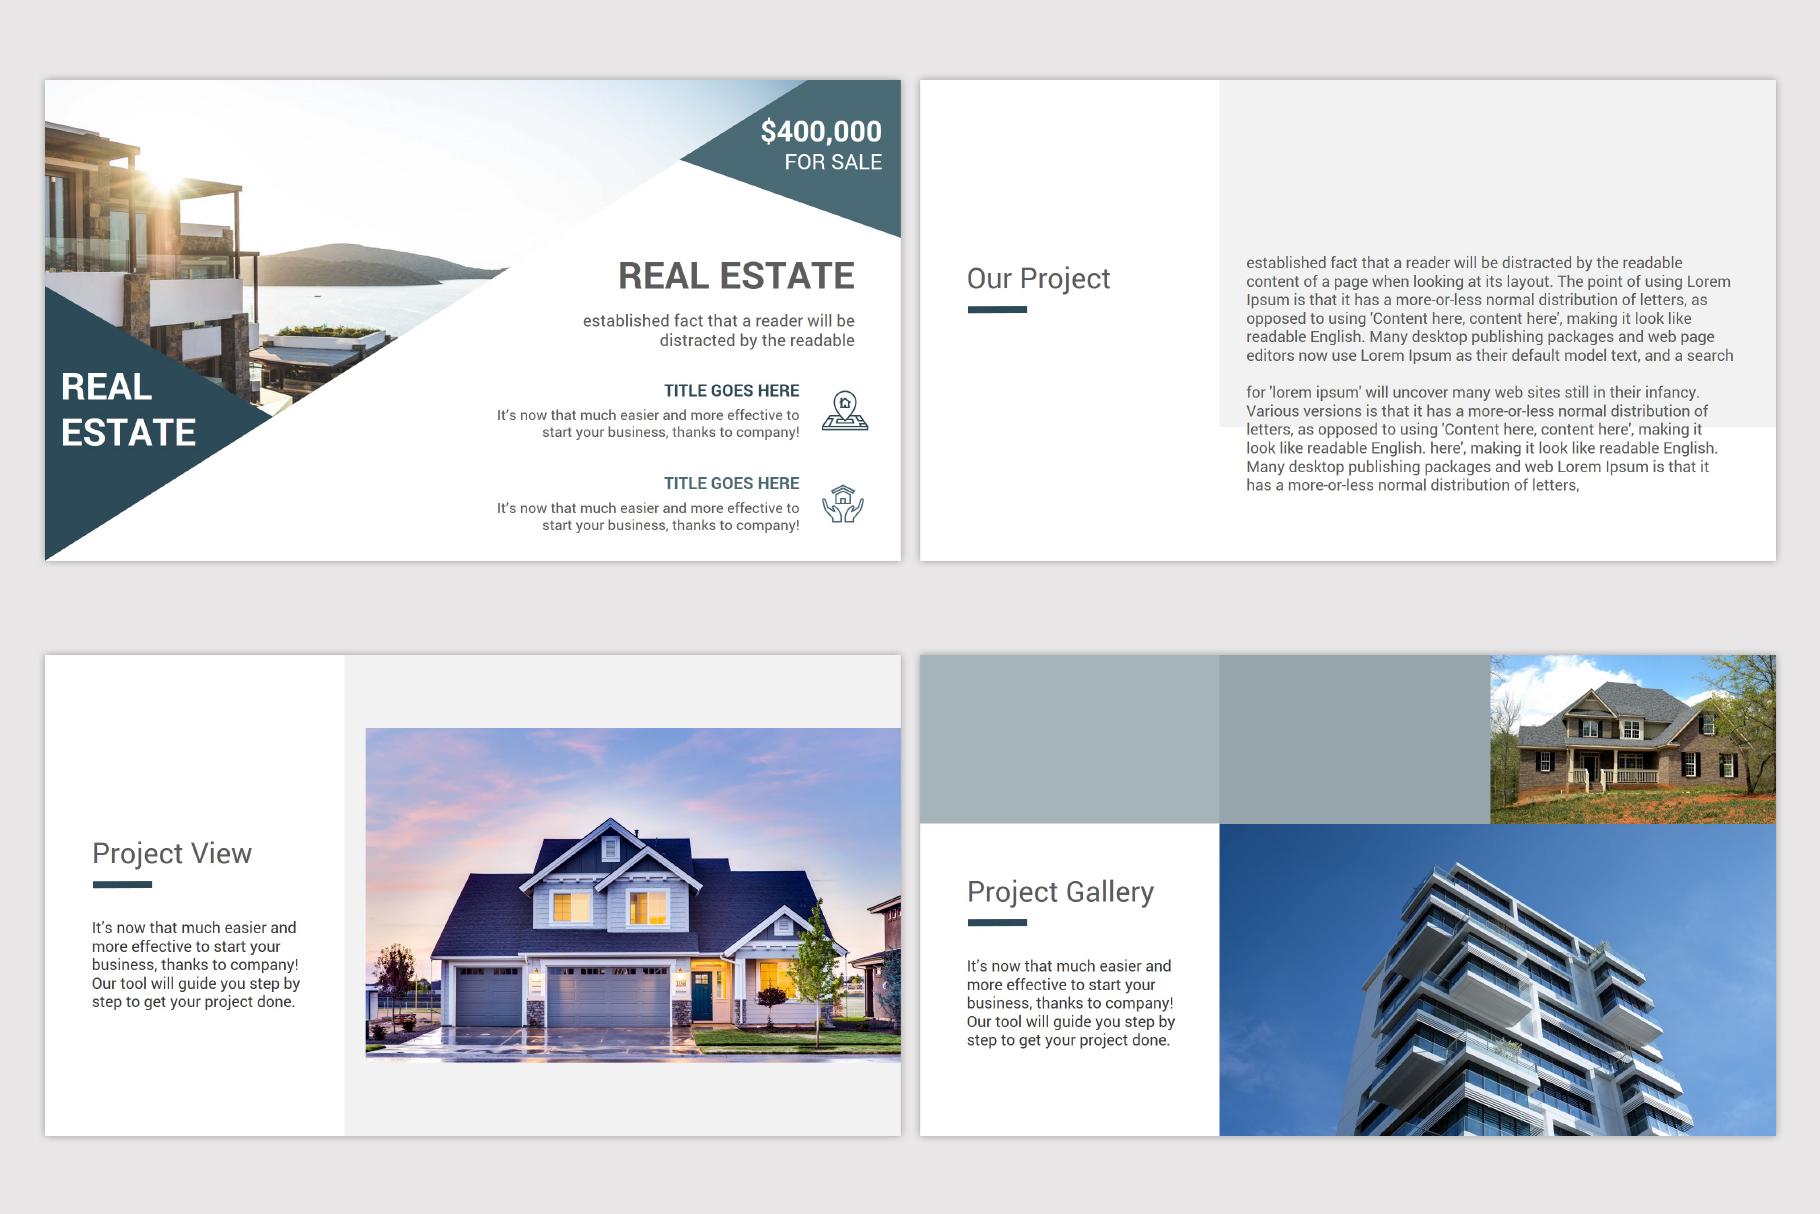 Real Estate Google Slides Template example image 6